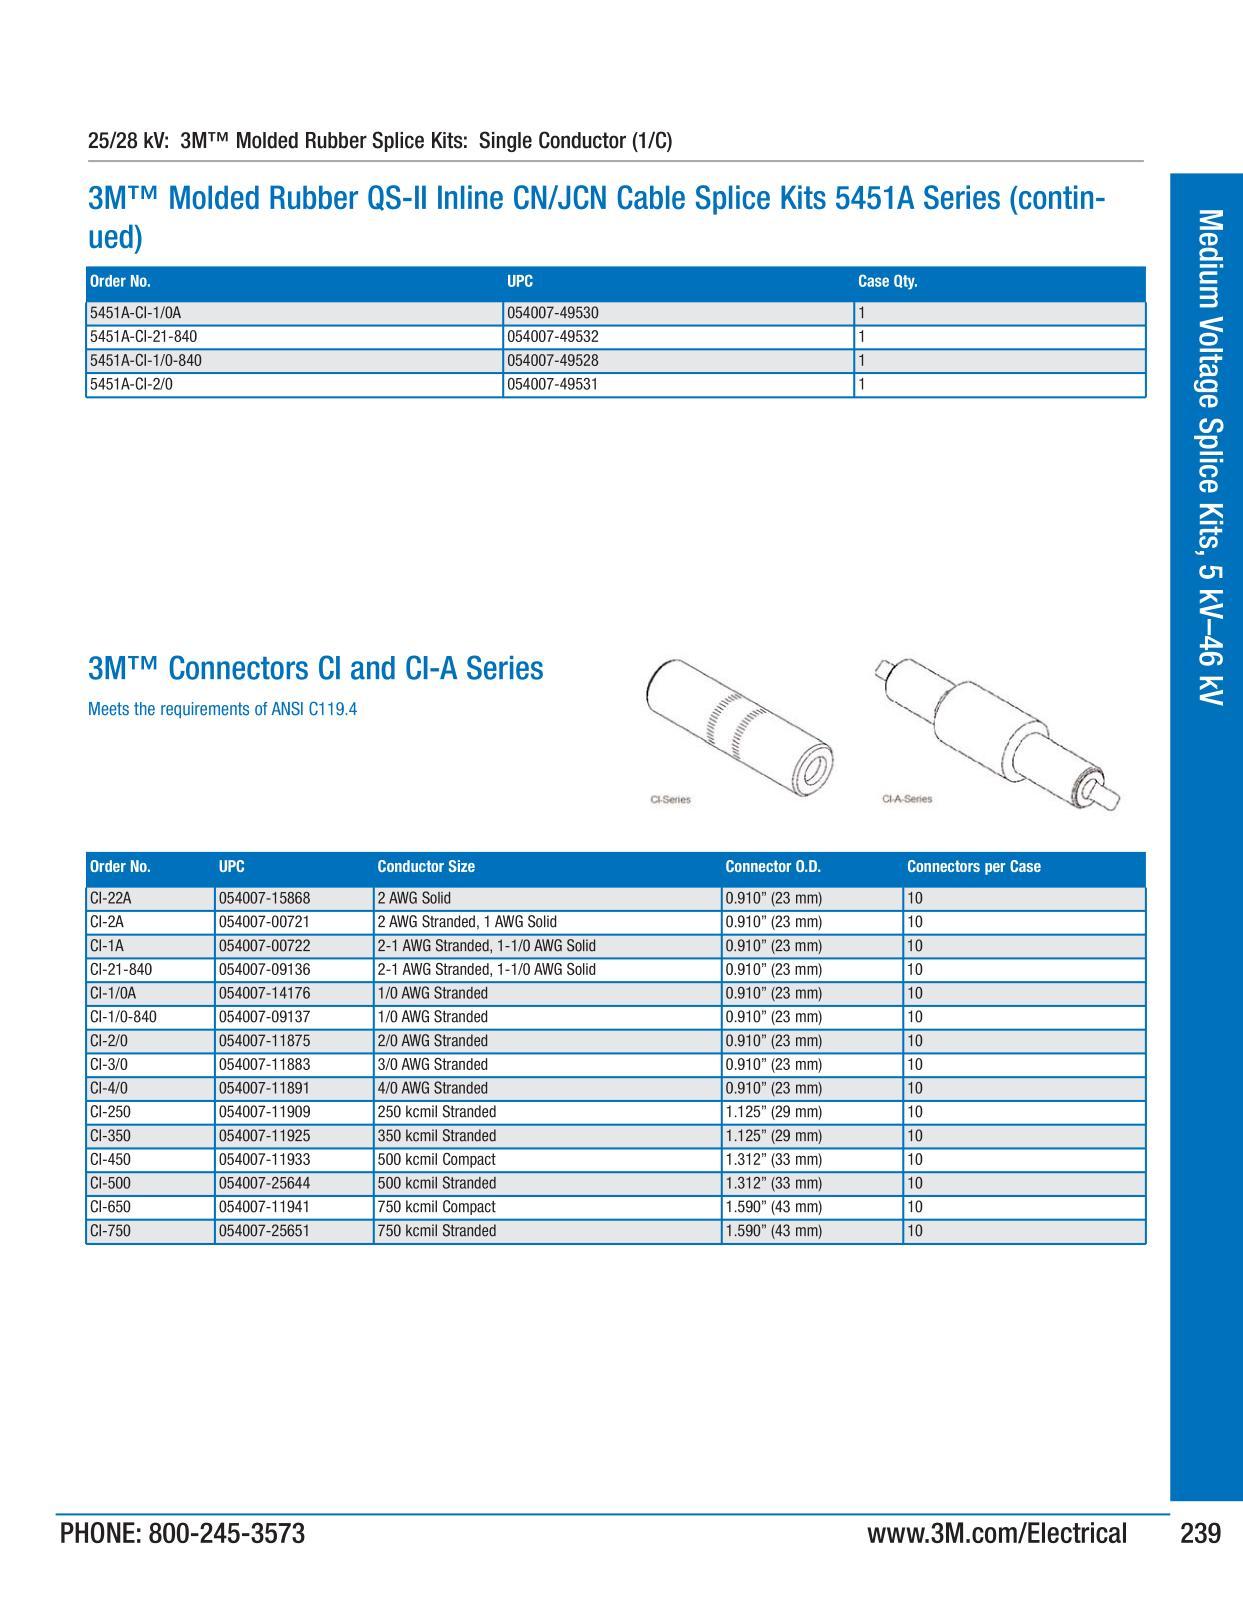 Medium Voltage Splice Kits, 5 kV 46 kV - 3M Electrical Products ...